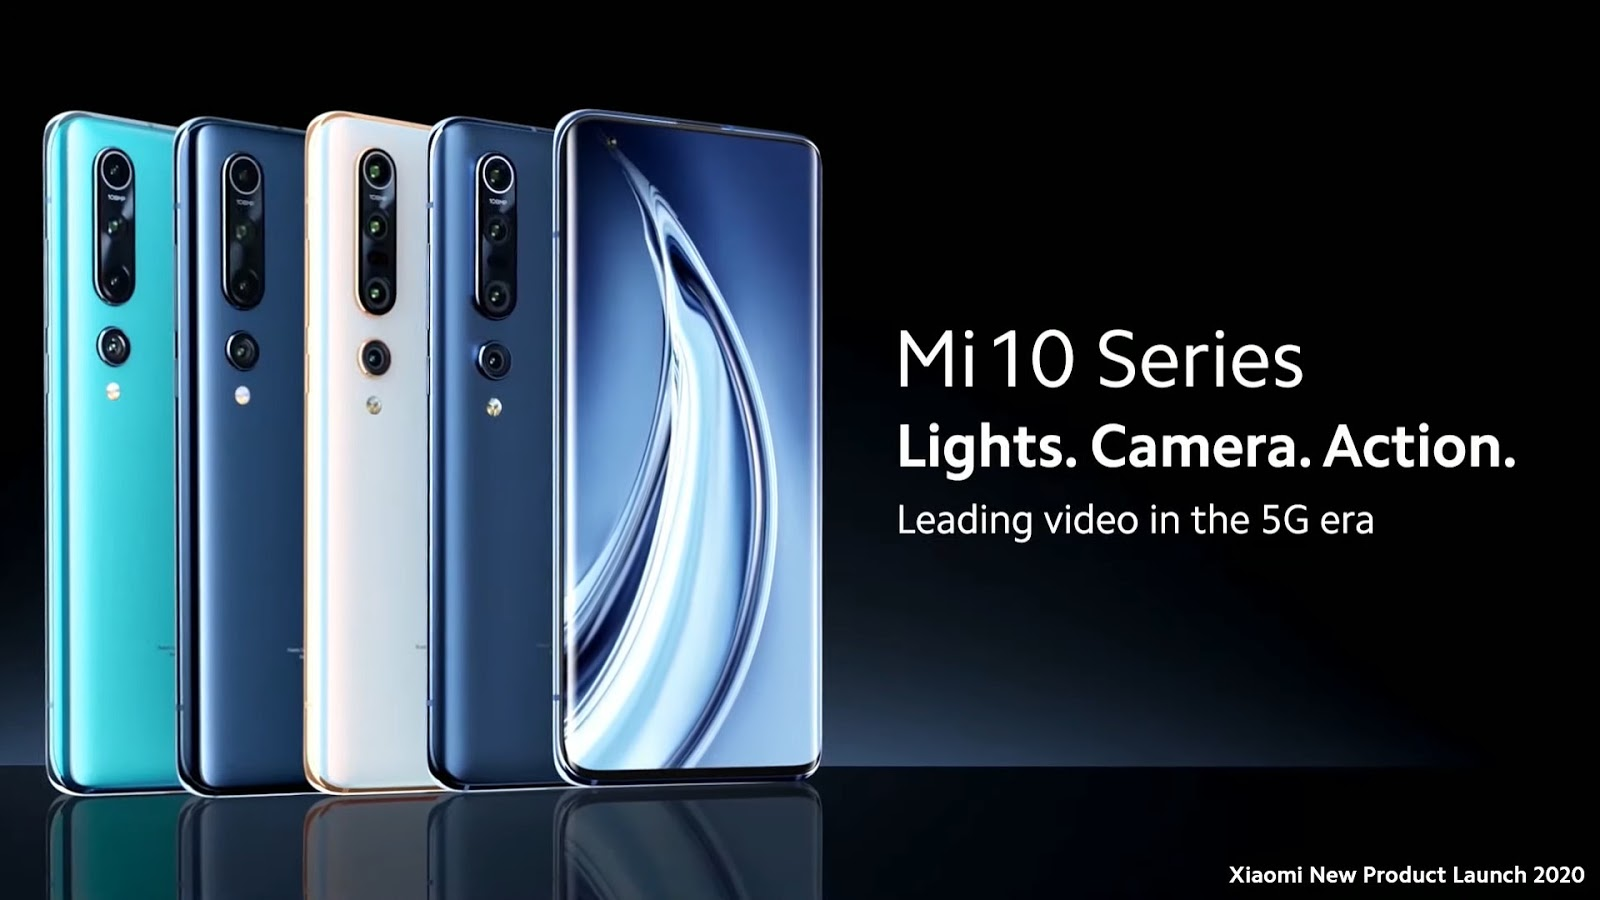 Xiaomi เผยยอดขายสมาร์ทโฟนเรือธง Mi 10 series ทุบสถิติใหม่ กวาดยอดขาย 1 ล้านเครื่องหลังเปิดตัวสู่ตลาดเพียง 1 เดือน